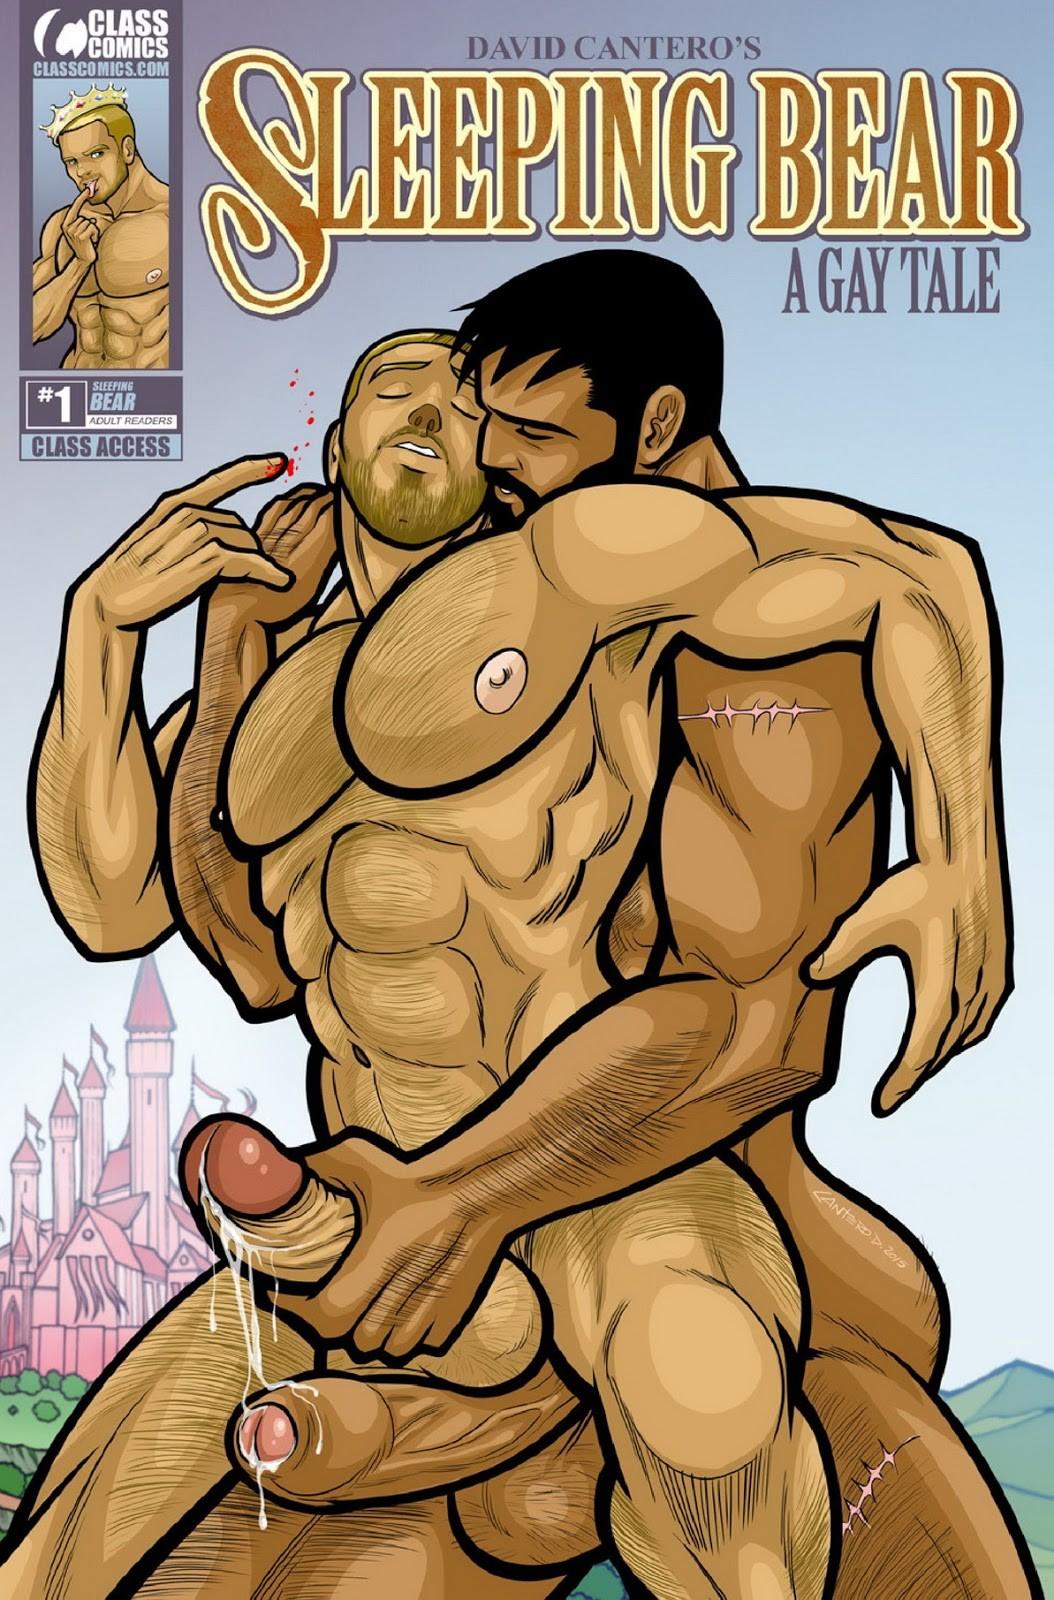 Sleeping Bear: A Gay Tale